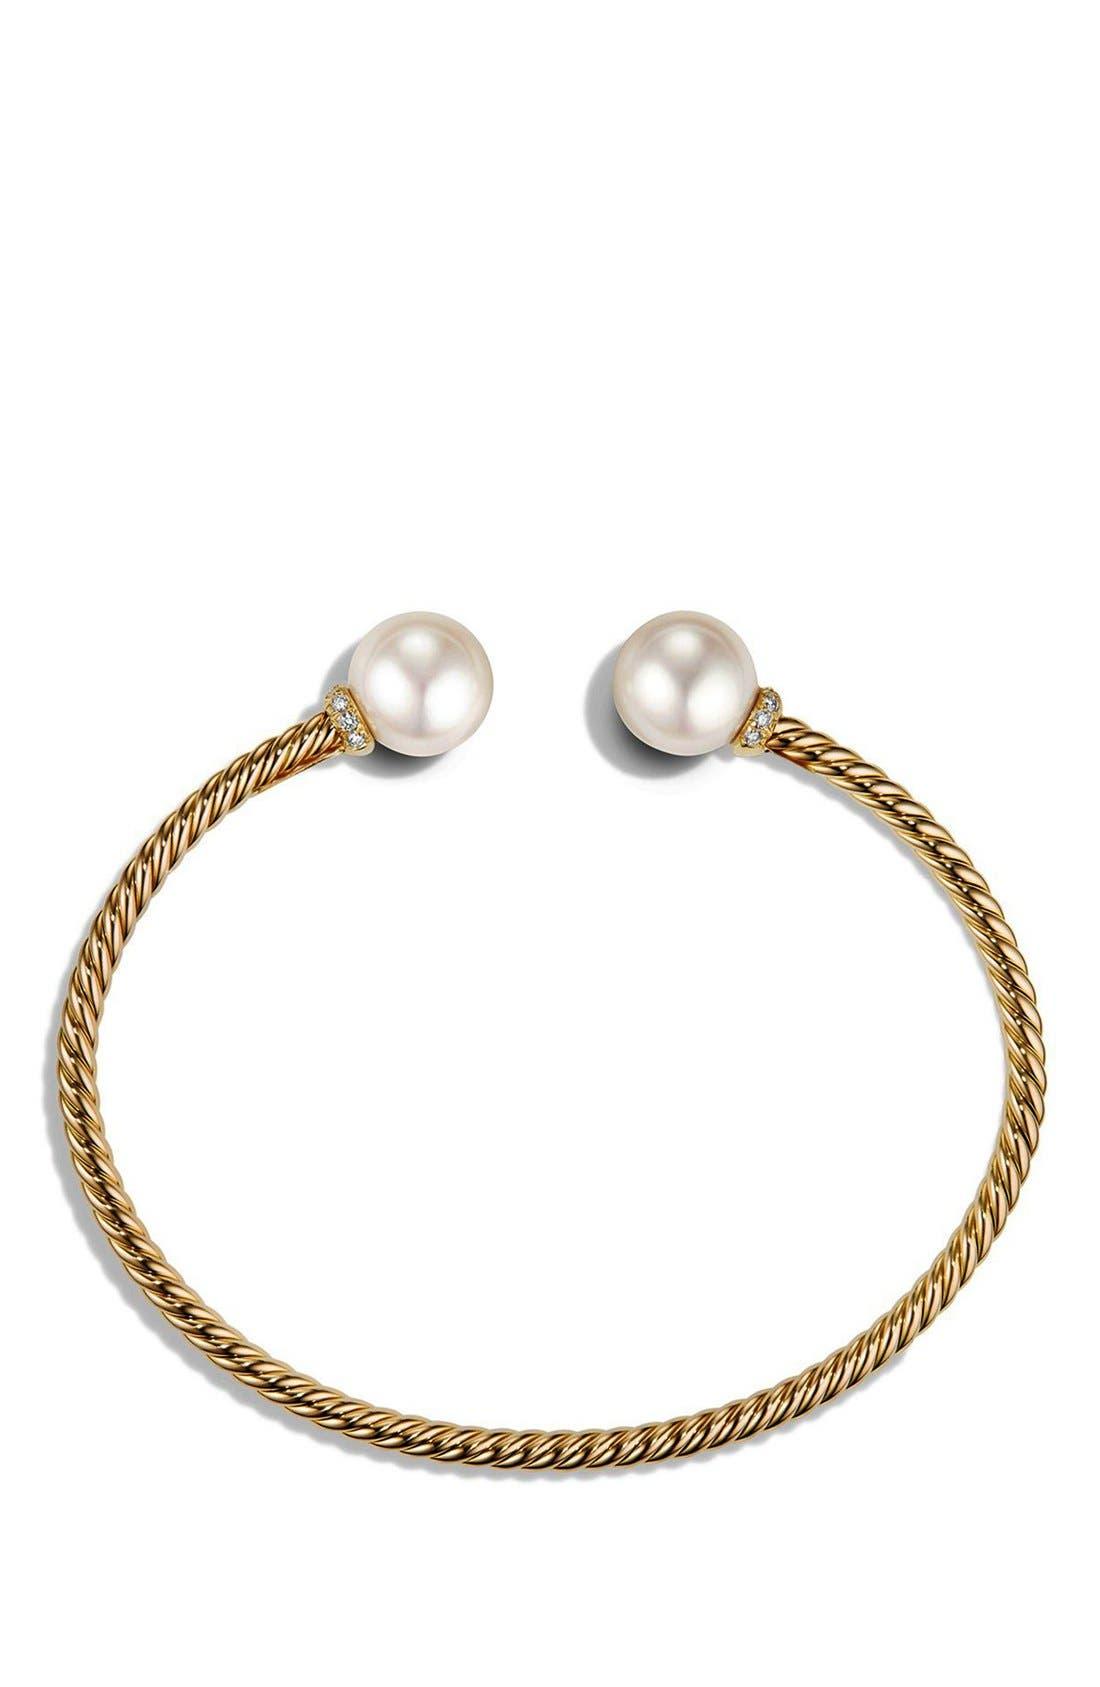 Alternate Image 2  - David Yurman 'Solari' Bead Bracelet with Diamonds and Pearls in 18K Gold